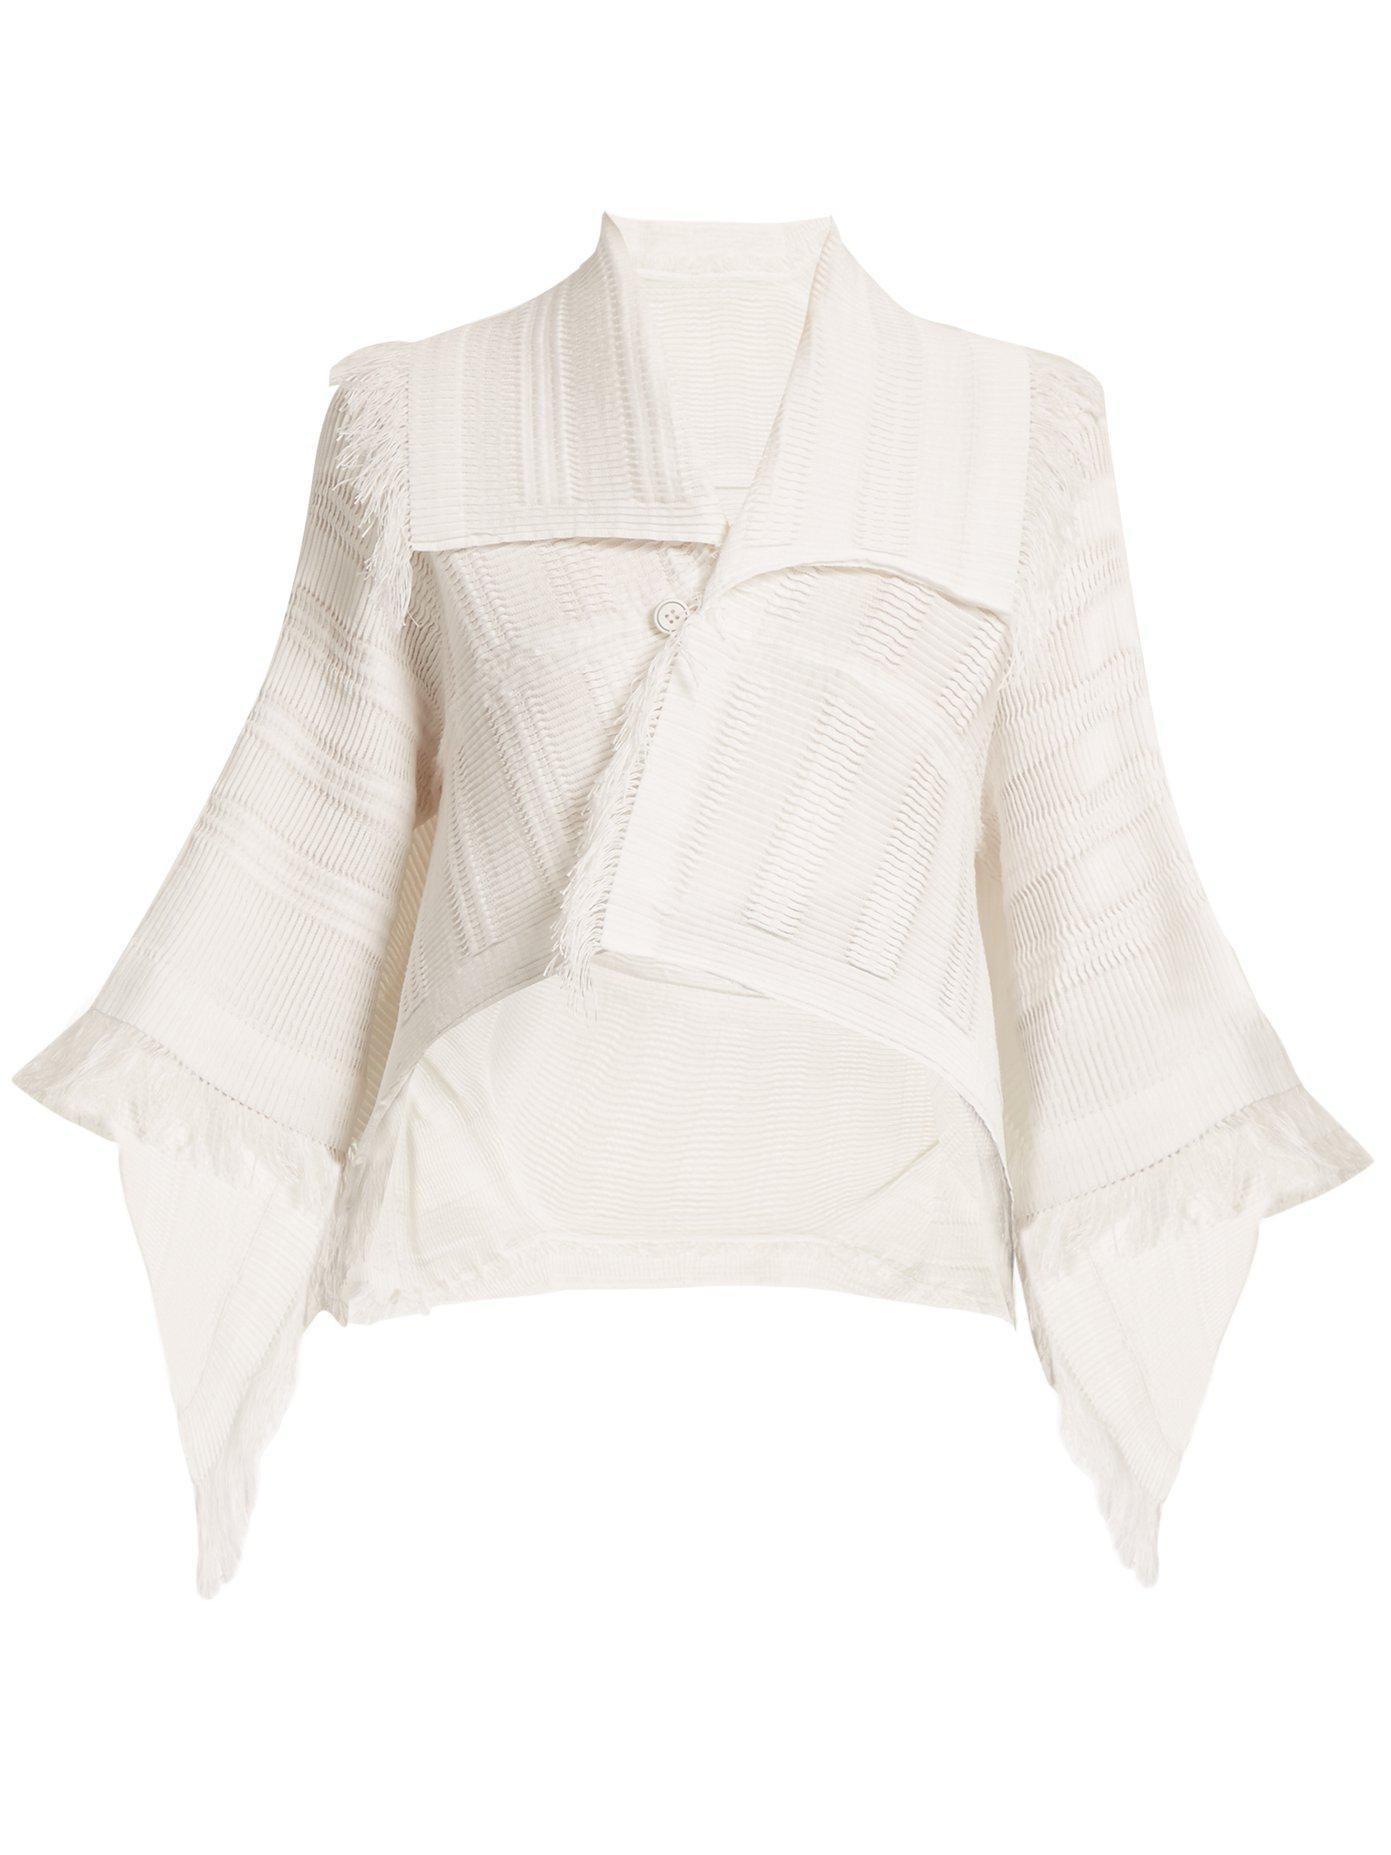 Choice Footlocker Sale Online Fringed pleated cropped jacket Issey Miyake Cheap Supply Fake Cheap Brand New Unisex MVRF7vZV8